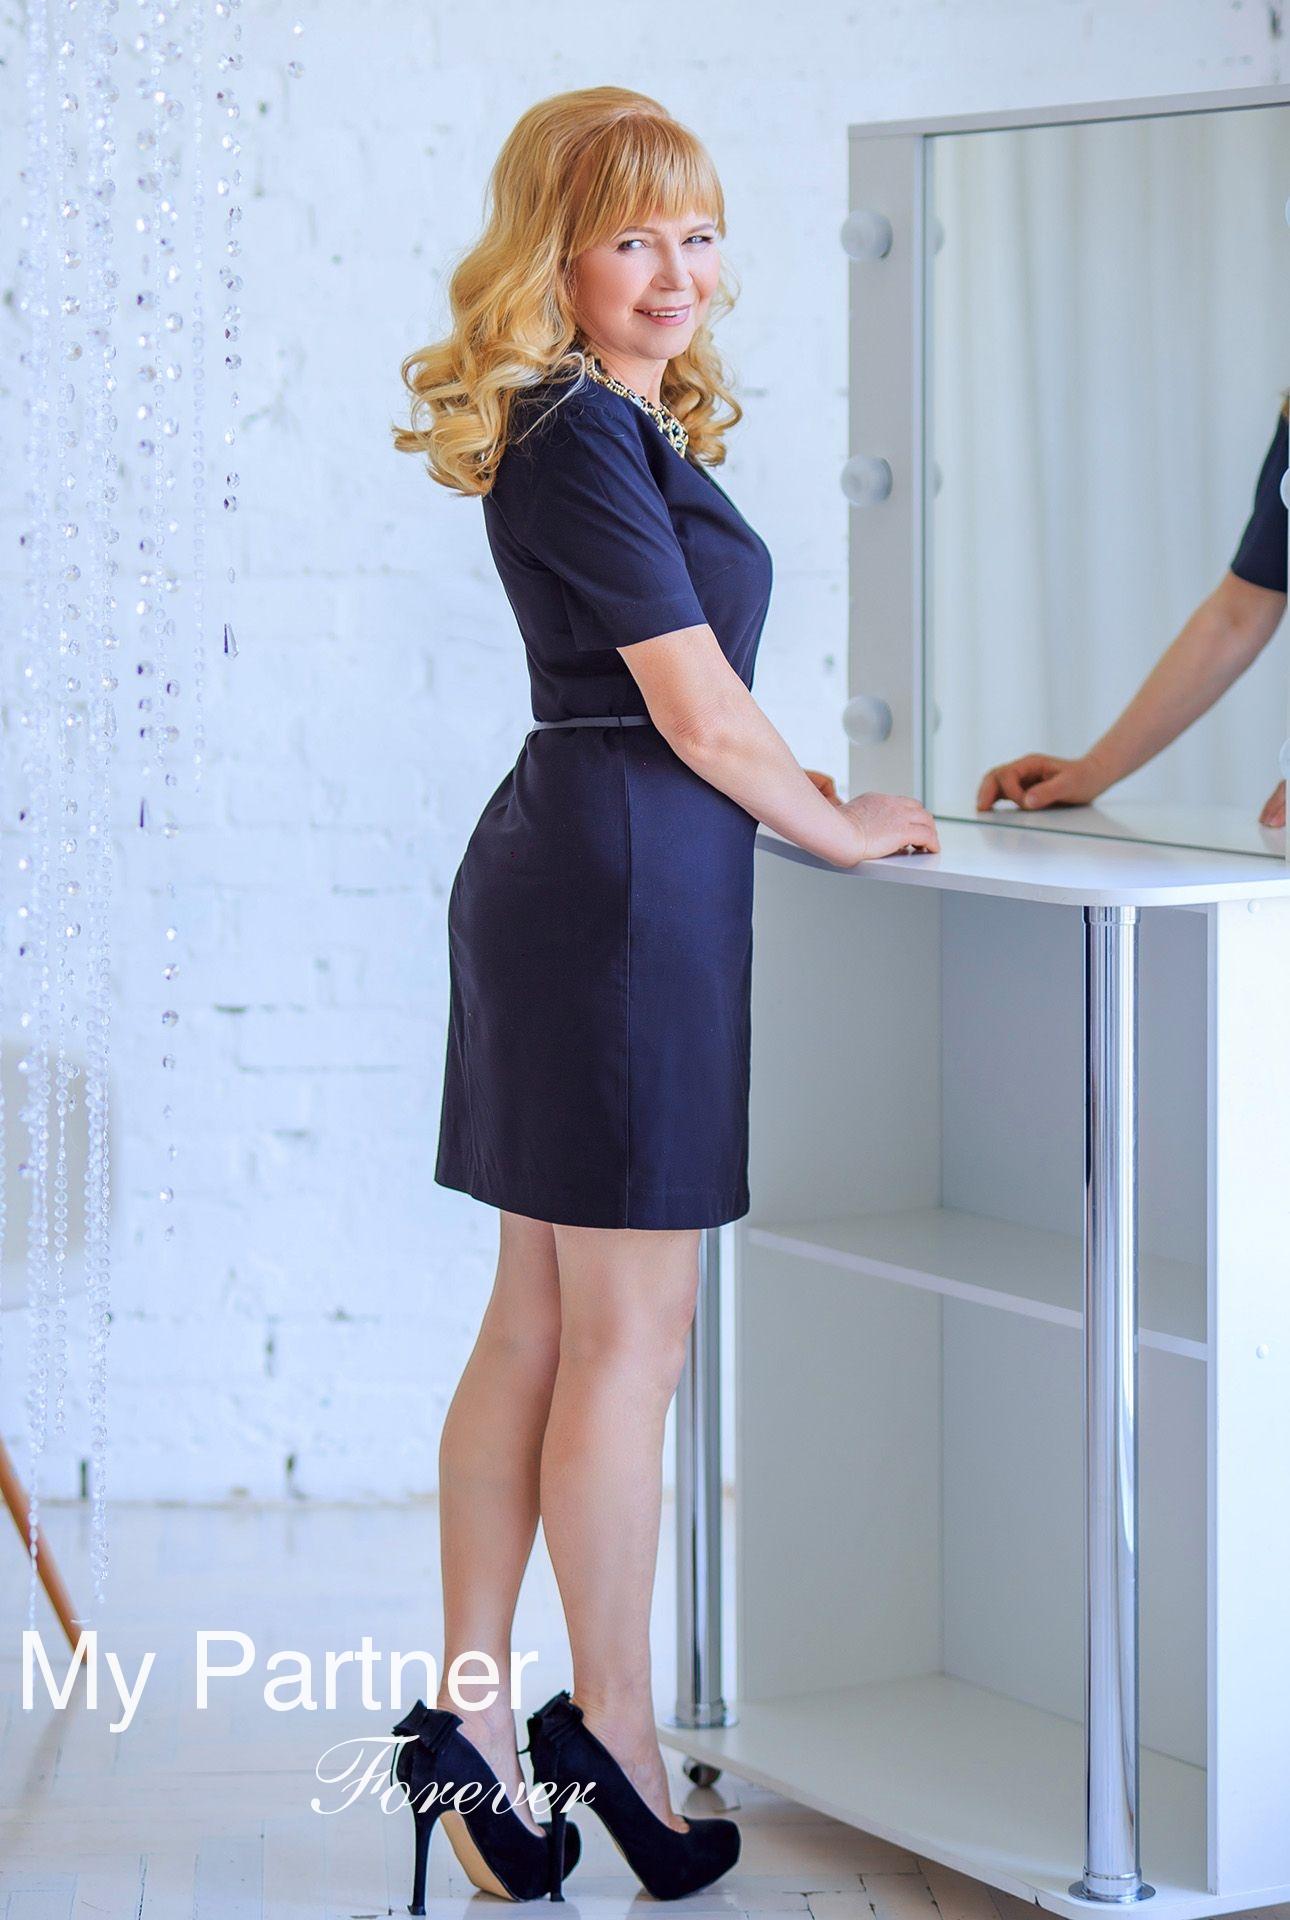 why are ukrainian women so beautiful